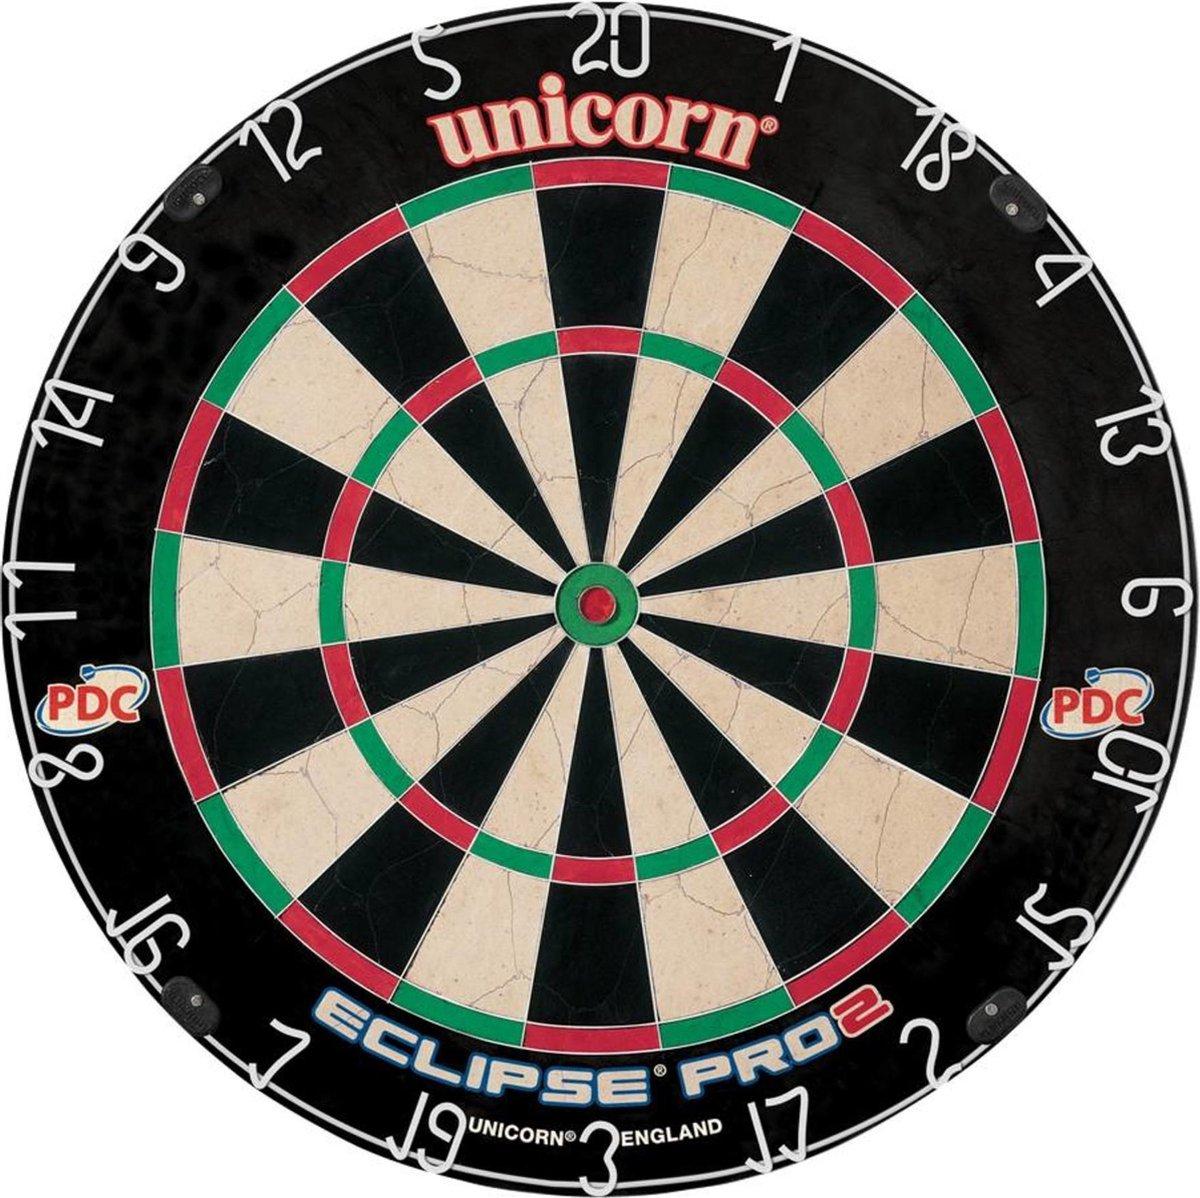 Dartbord Unicorn Eclipse Pro - zonder dartpijlen - sisal PDC - Darts darten - Dartstandaard niet nodig